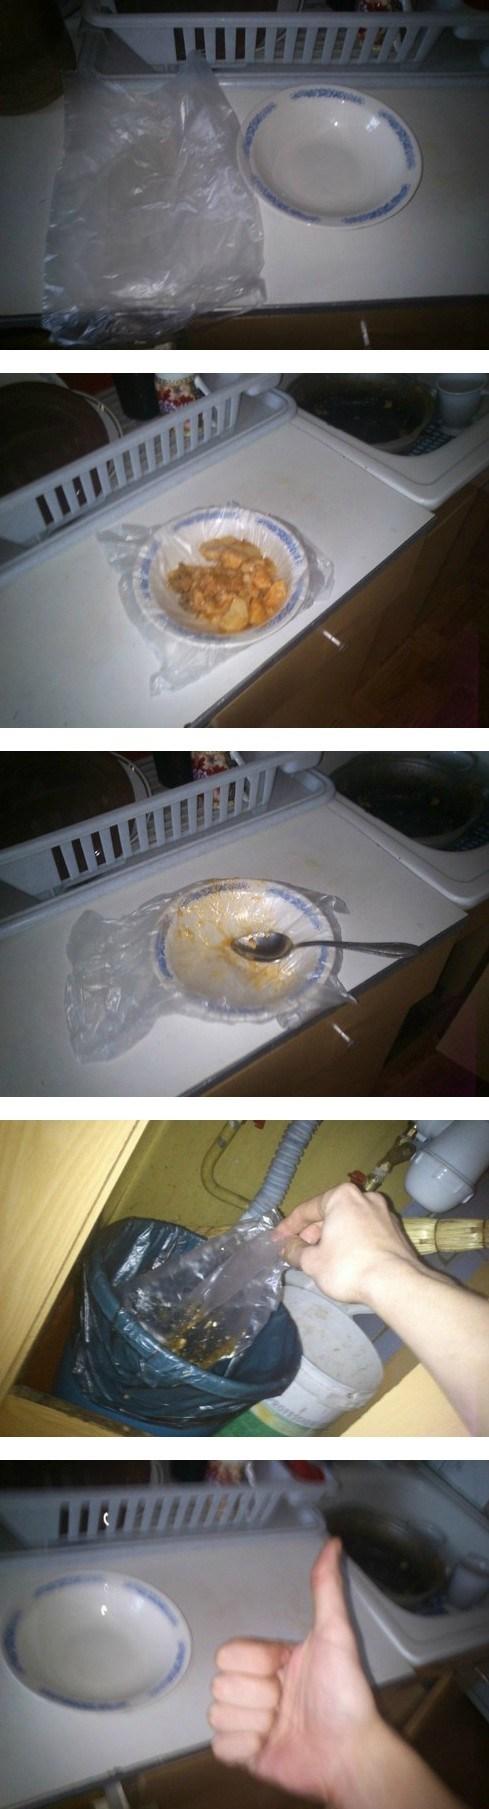 bowls dishes dishwasher kitchen plastic - 6610543872